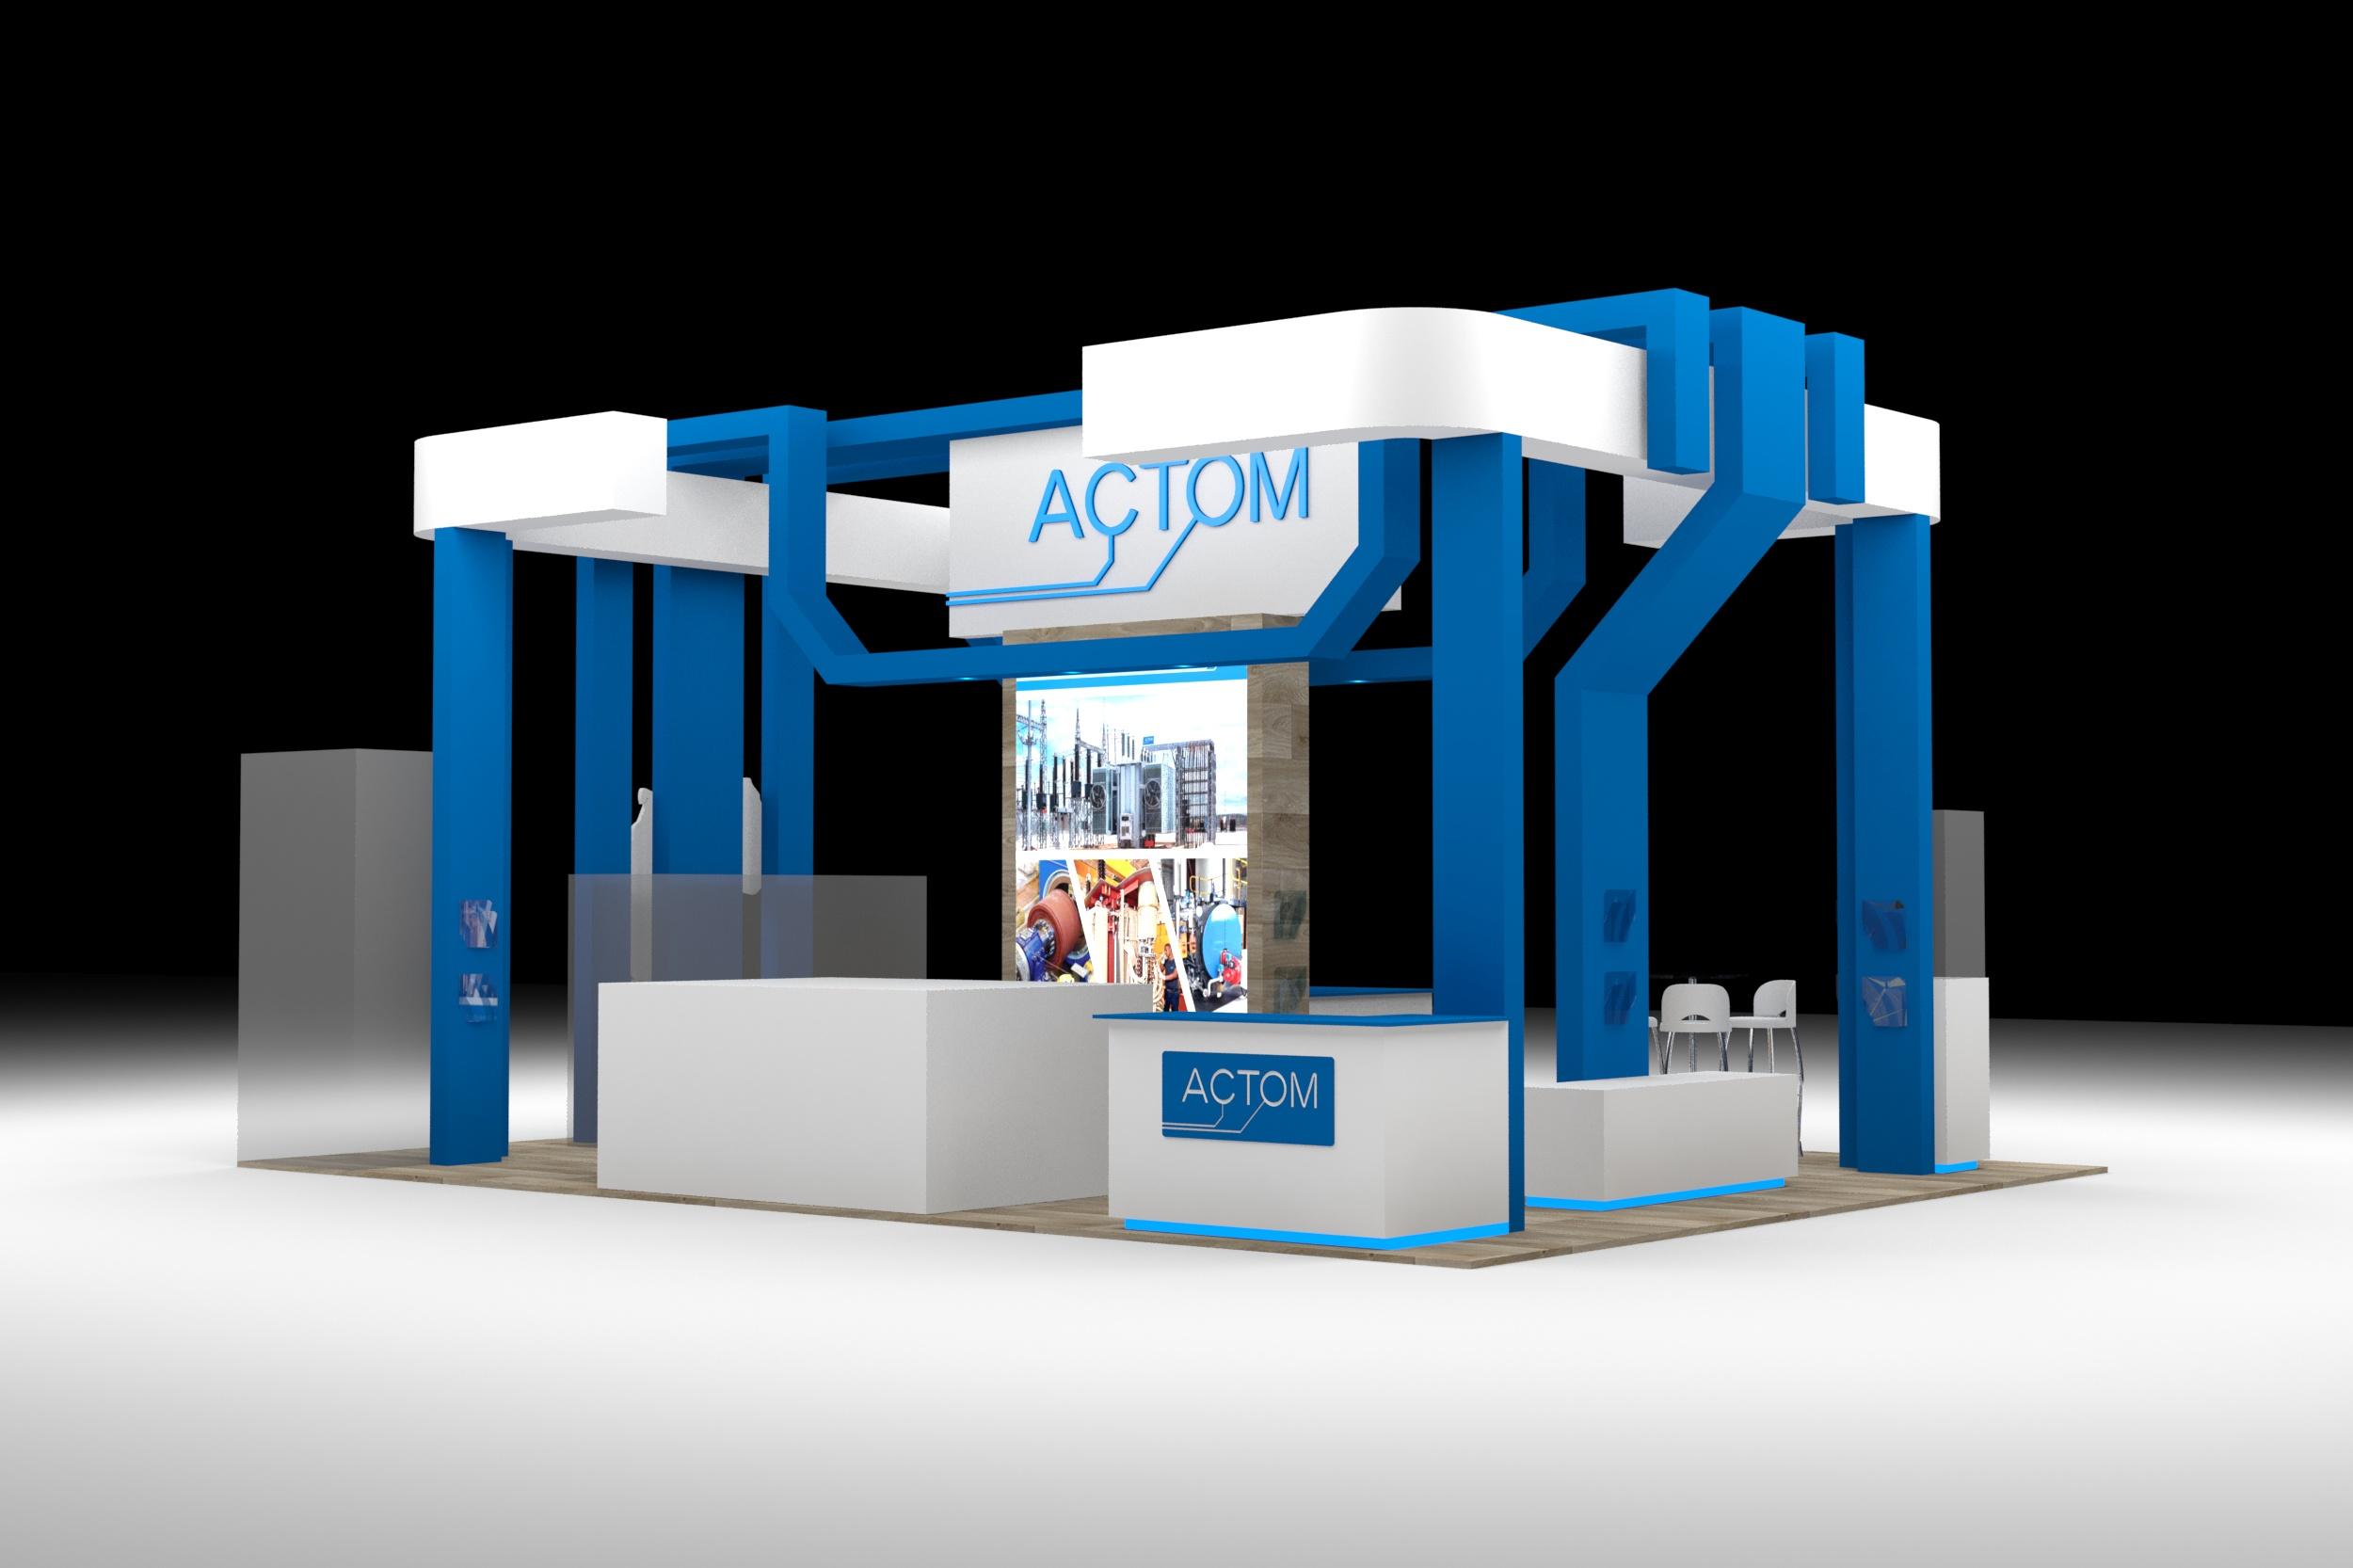 SugarLab Creative - Exhibition Stand Design - Actom